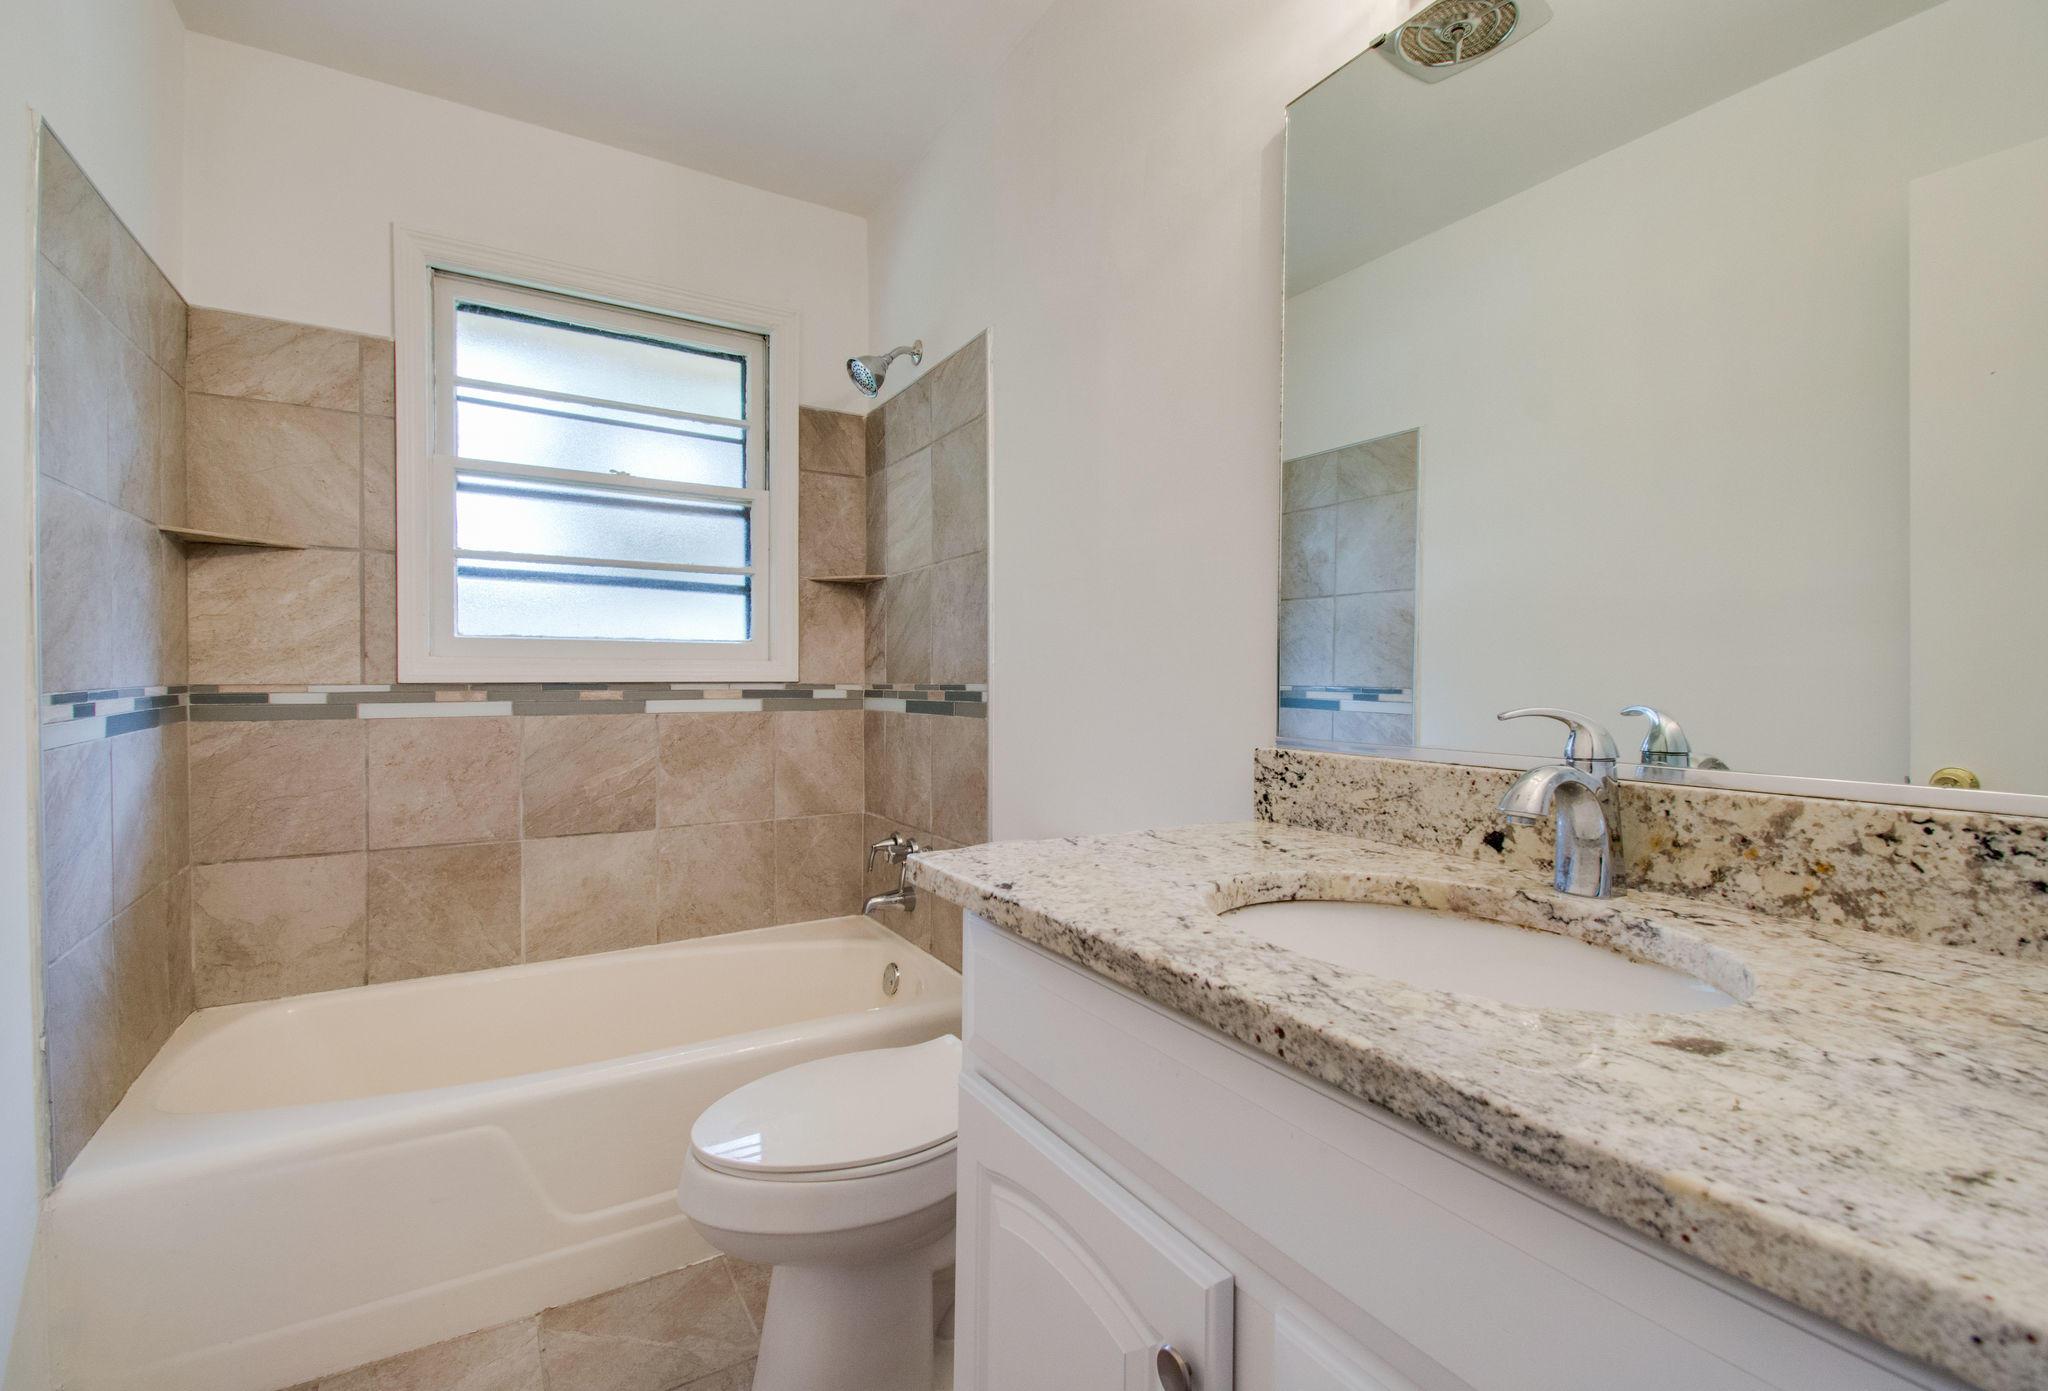 Northbridge Terrace Homes For Sale - 1114 Northbridge, Charleston, SC - 11